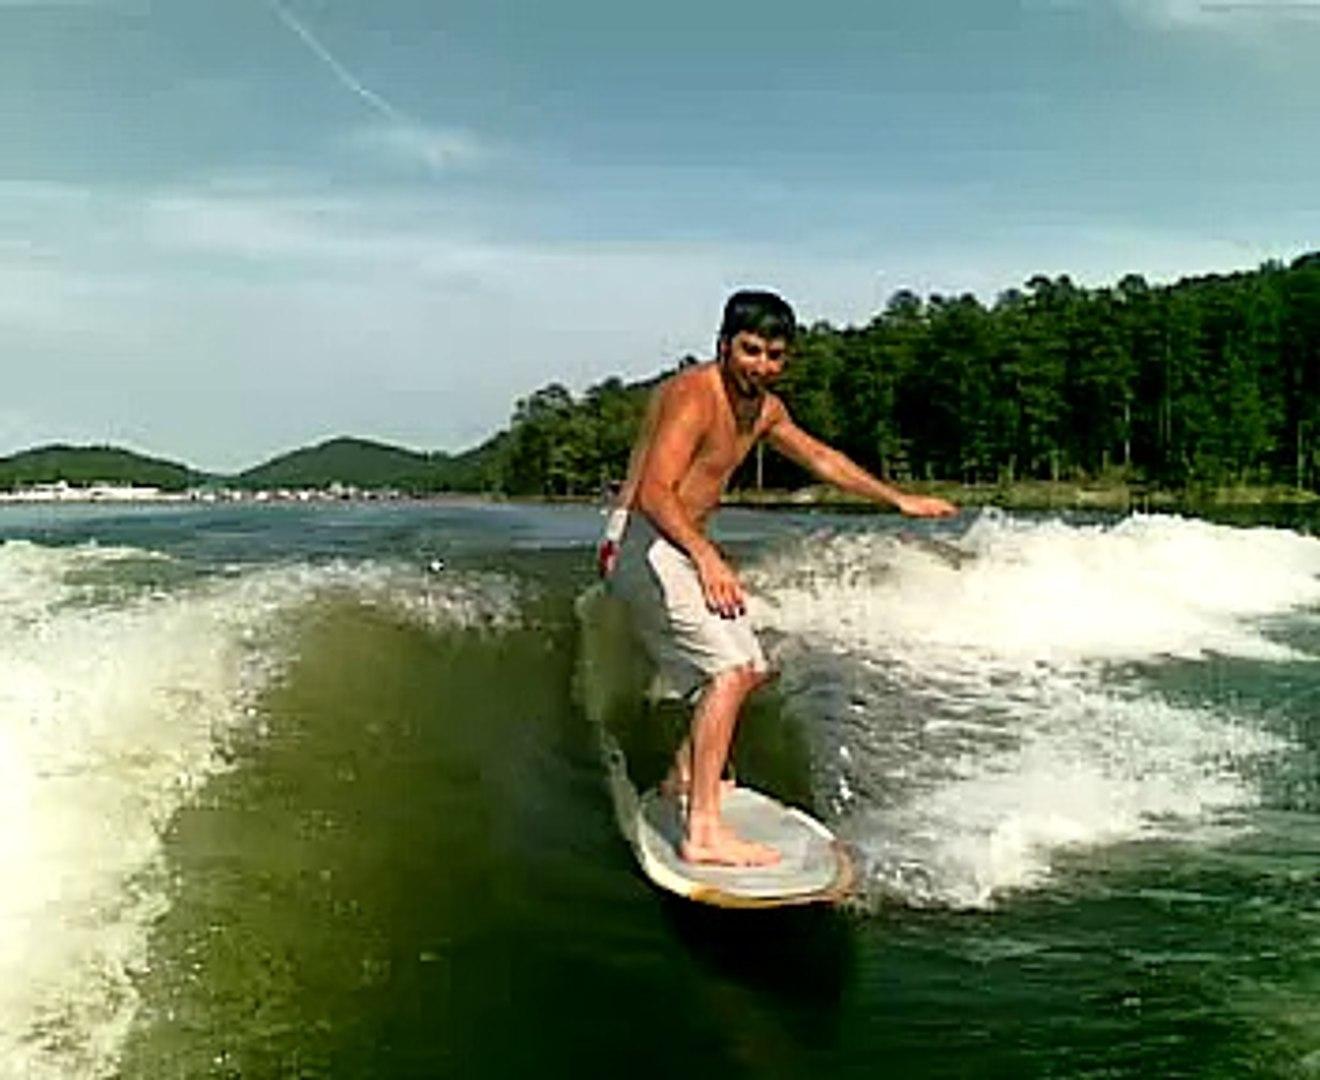 Corona beer surfing video.mp4